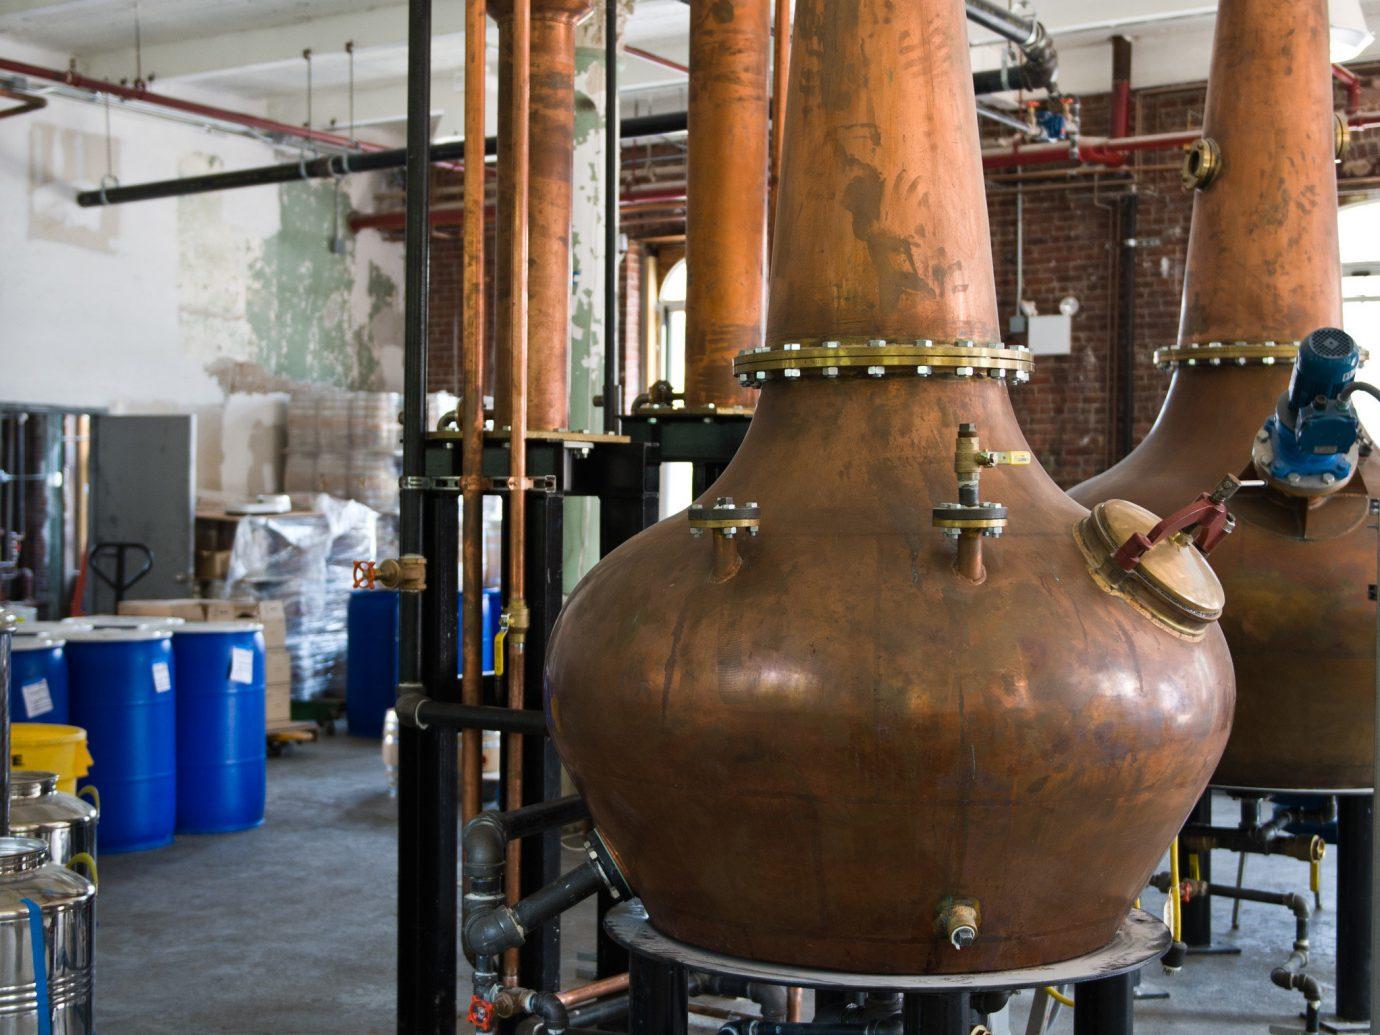 alcohol beverage Brooklyn distilled beverage distillery Drink Food + Drink industrial interior liqueur urban whiskey whisky factory industry